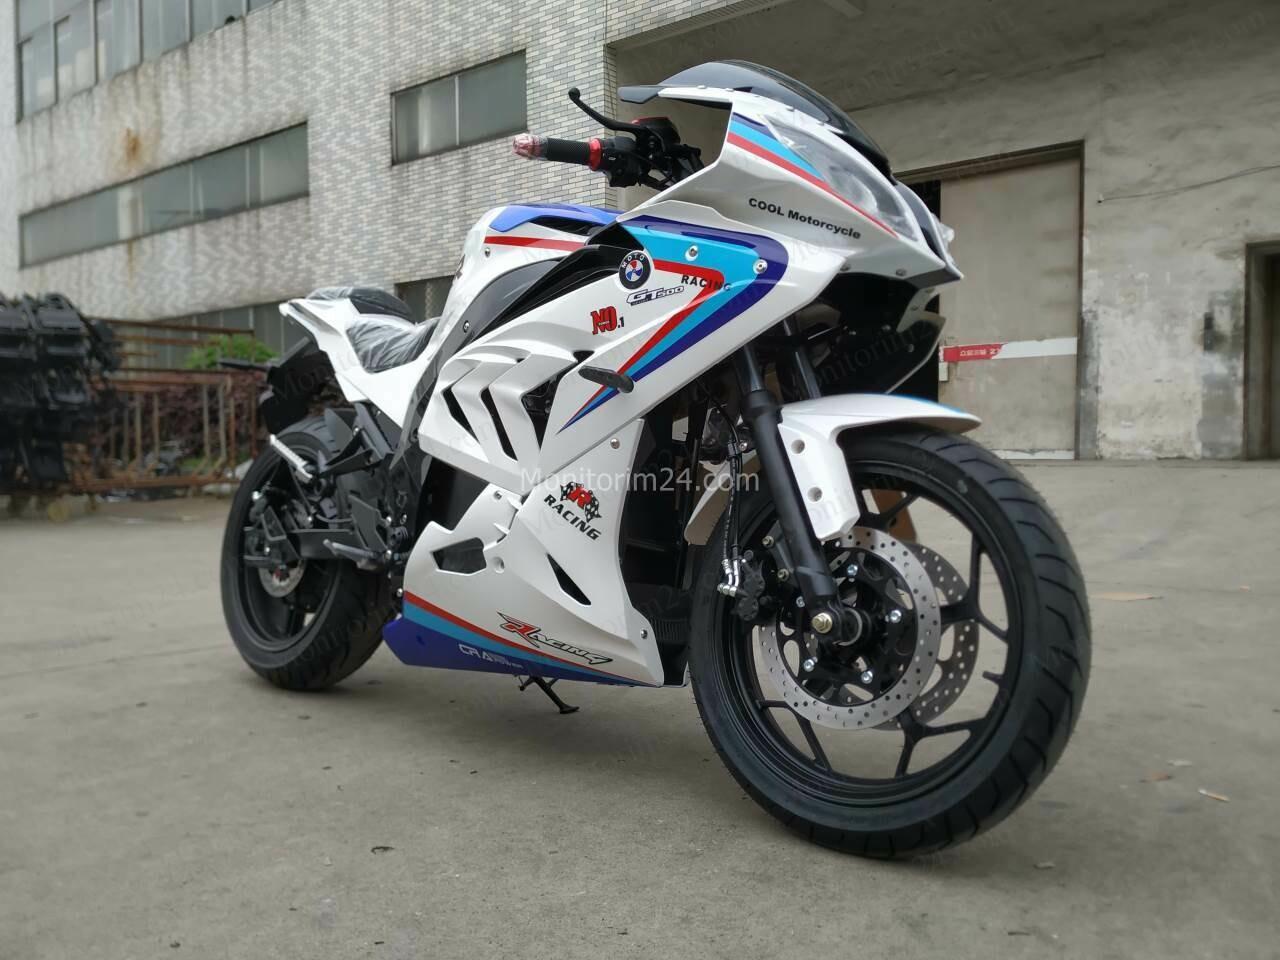 Электромотоцикл S1000 RR